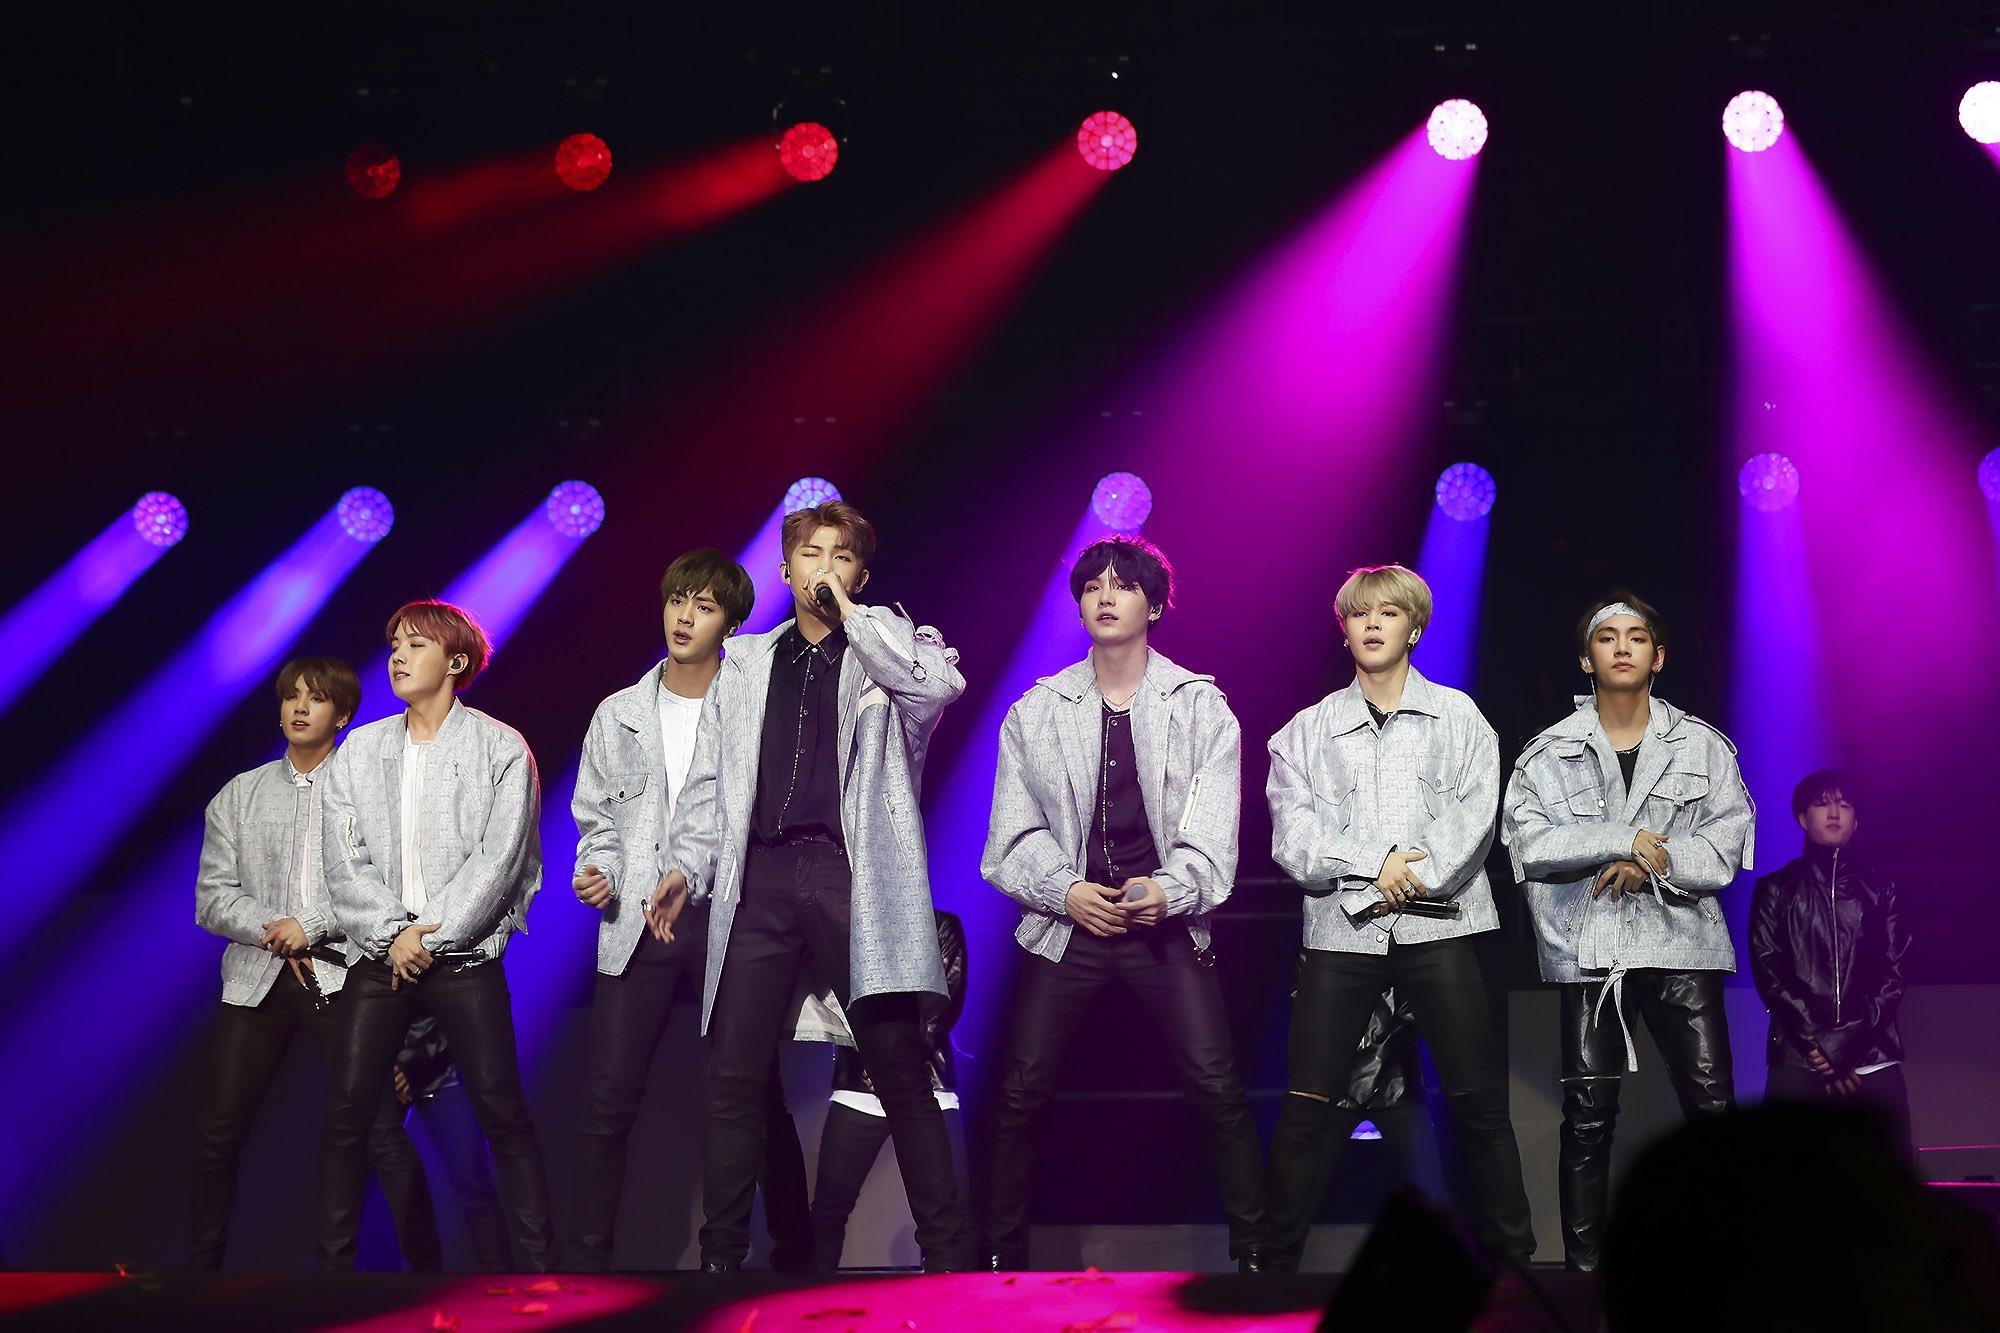 K-Pop boy band BTS touring Australia in May 2017